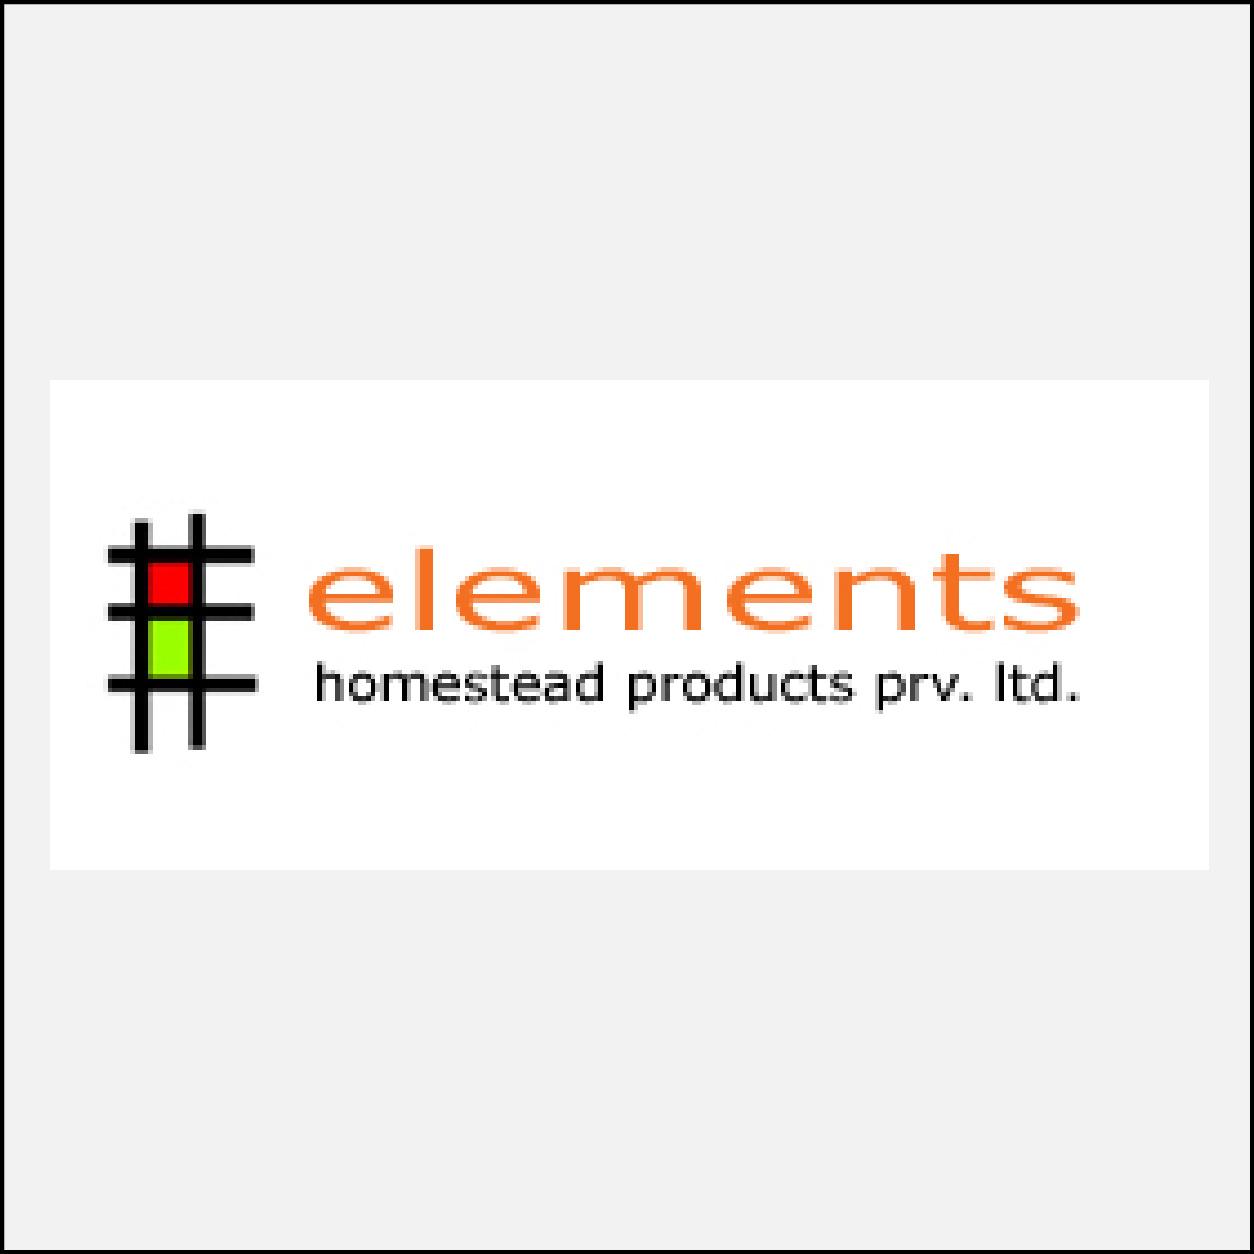 Elements montado